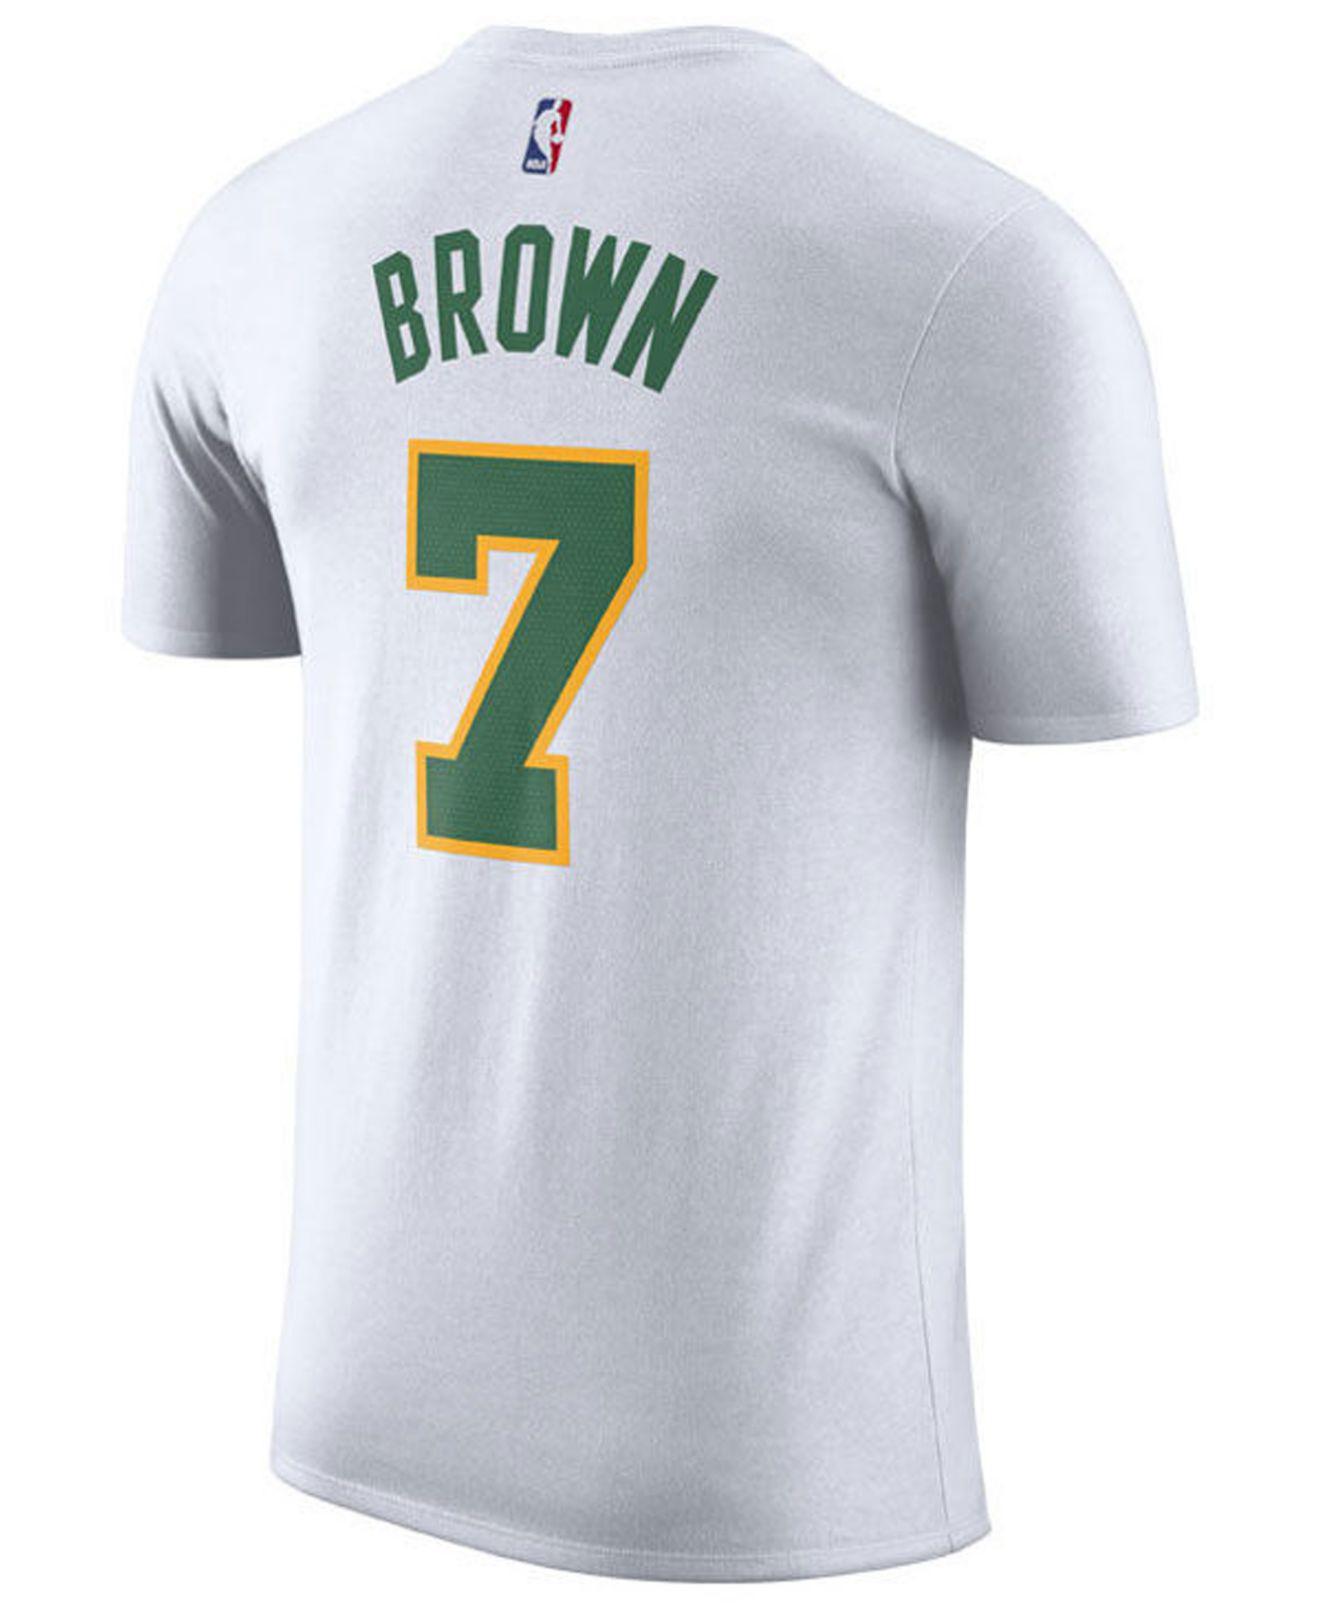 57a8e3af0 Lyst - Nike Jaylen Brown Boston Celtics City Player T-shirt 2018 in White  for Men